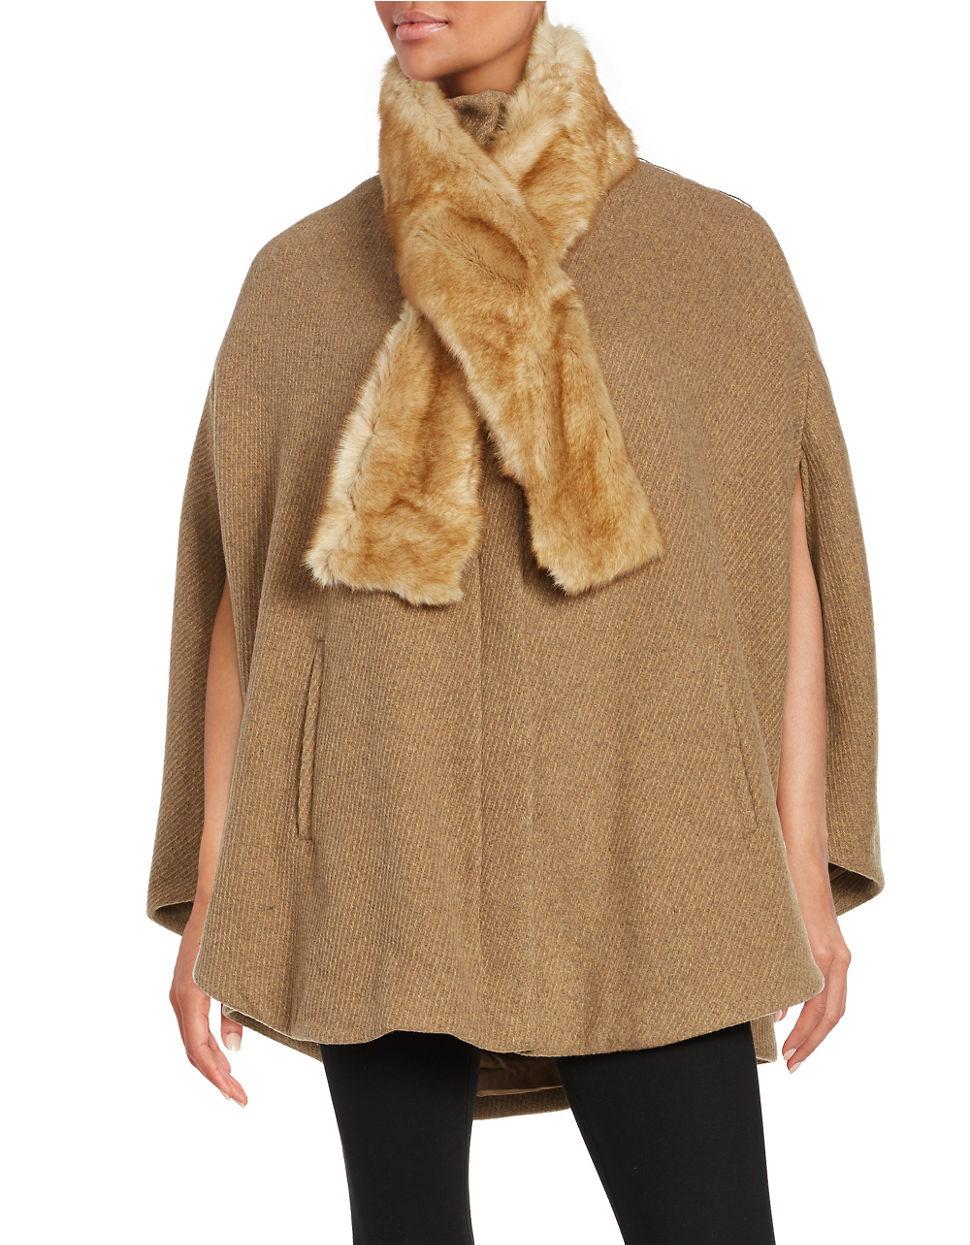 Ivanka trump Faux Fur-trimmed Wool-blend Cape in Natural | Lyst